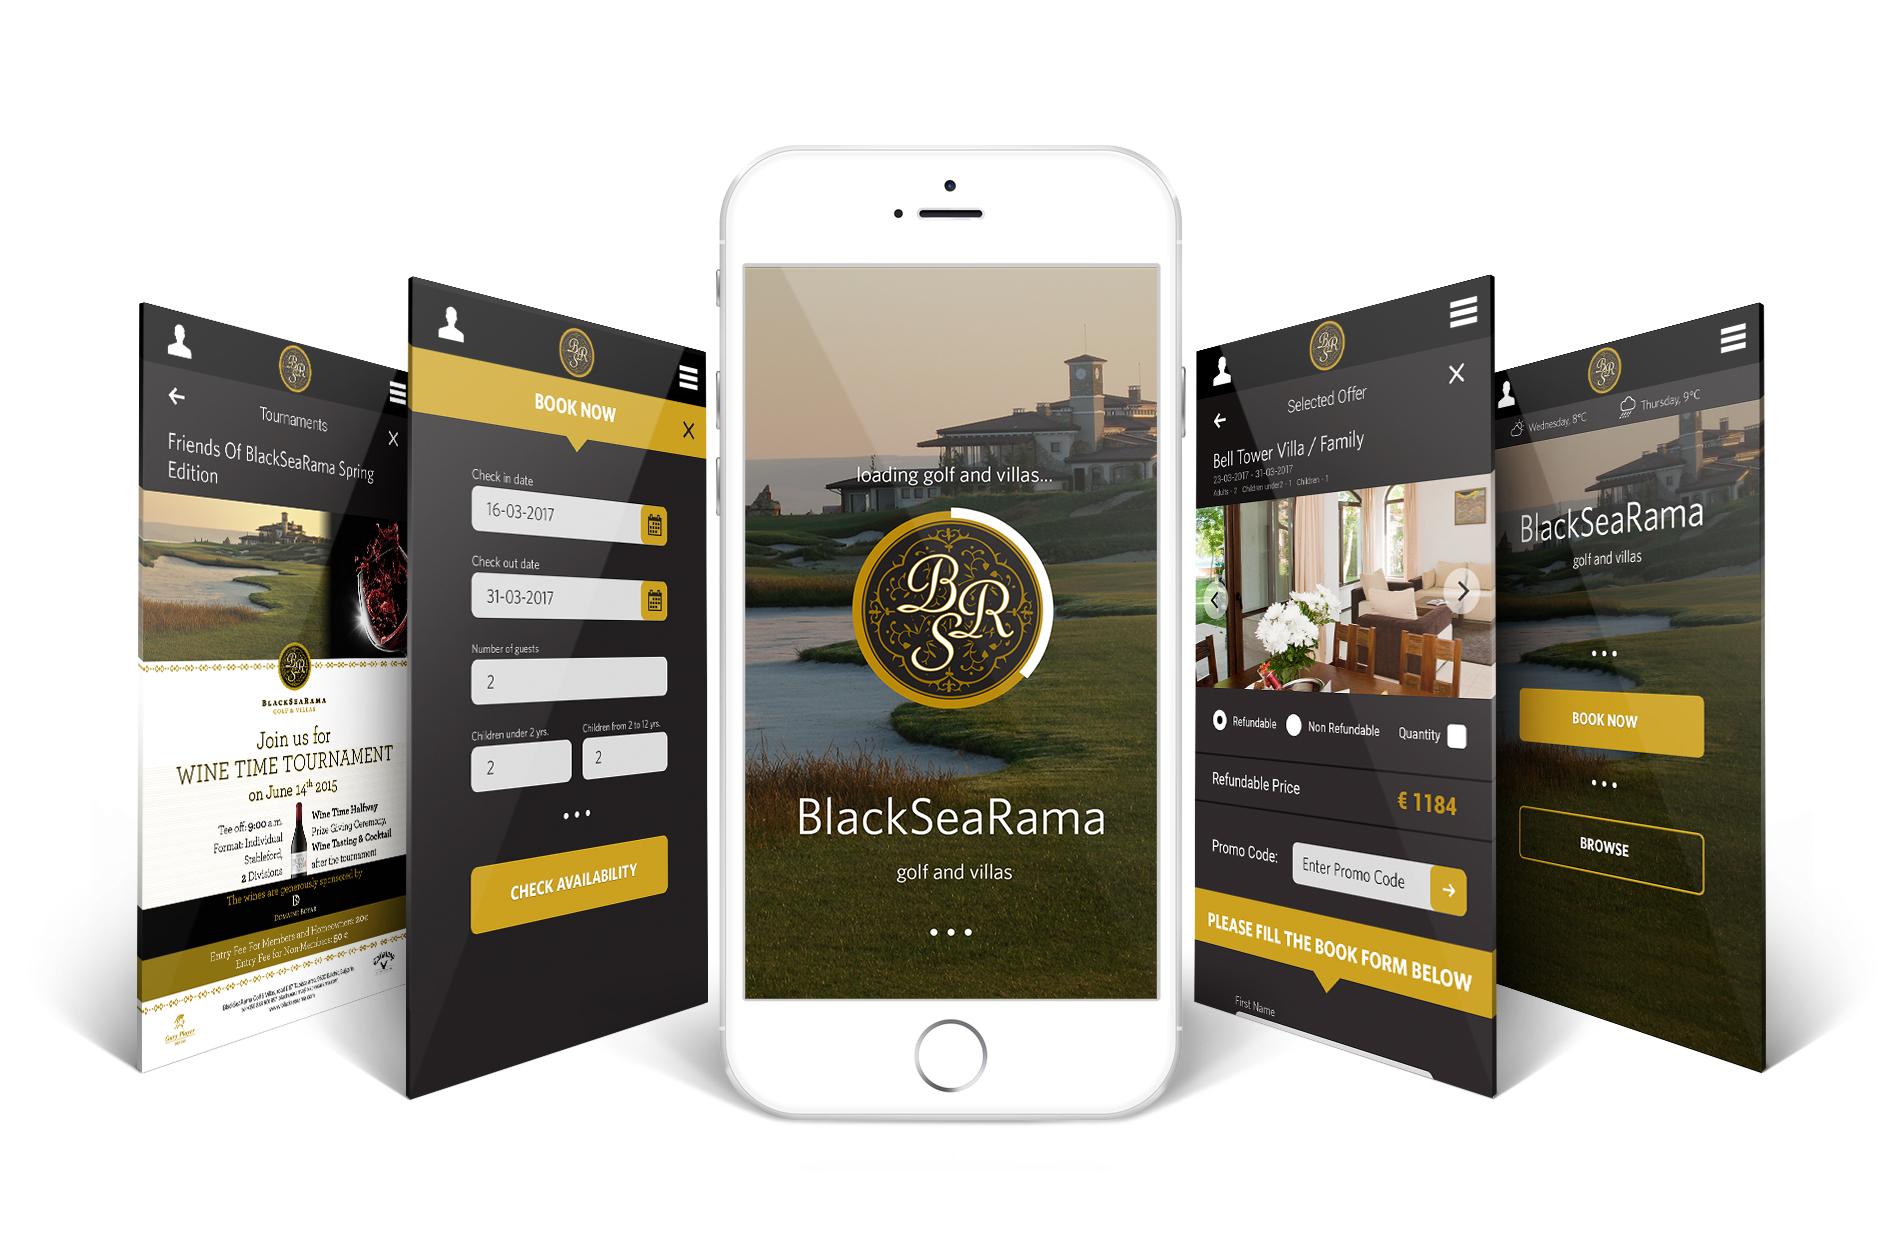 Black Sea Rama application